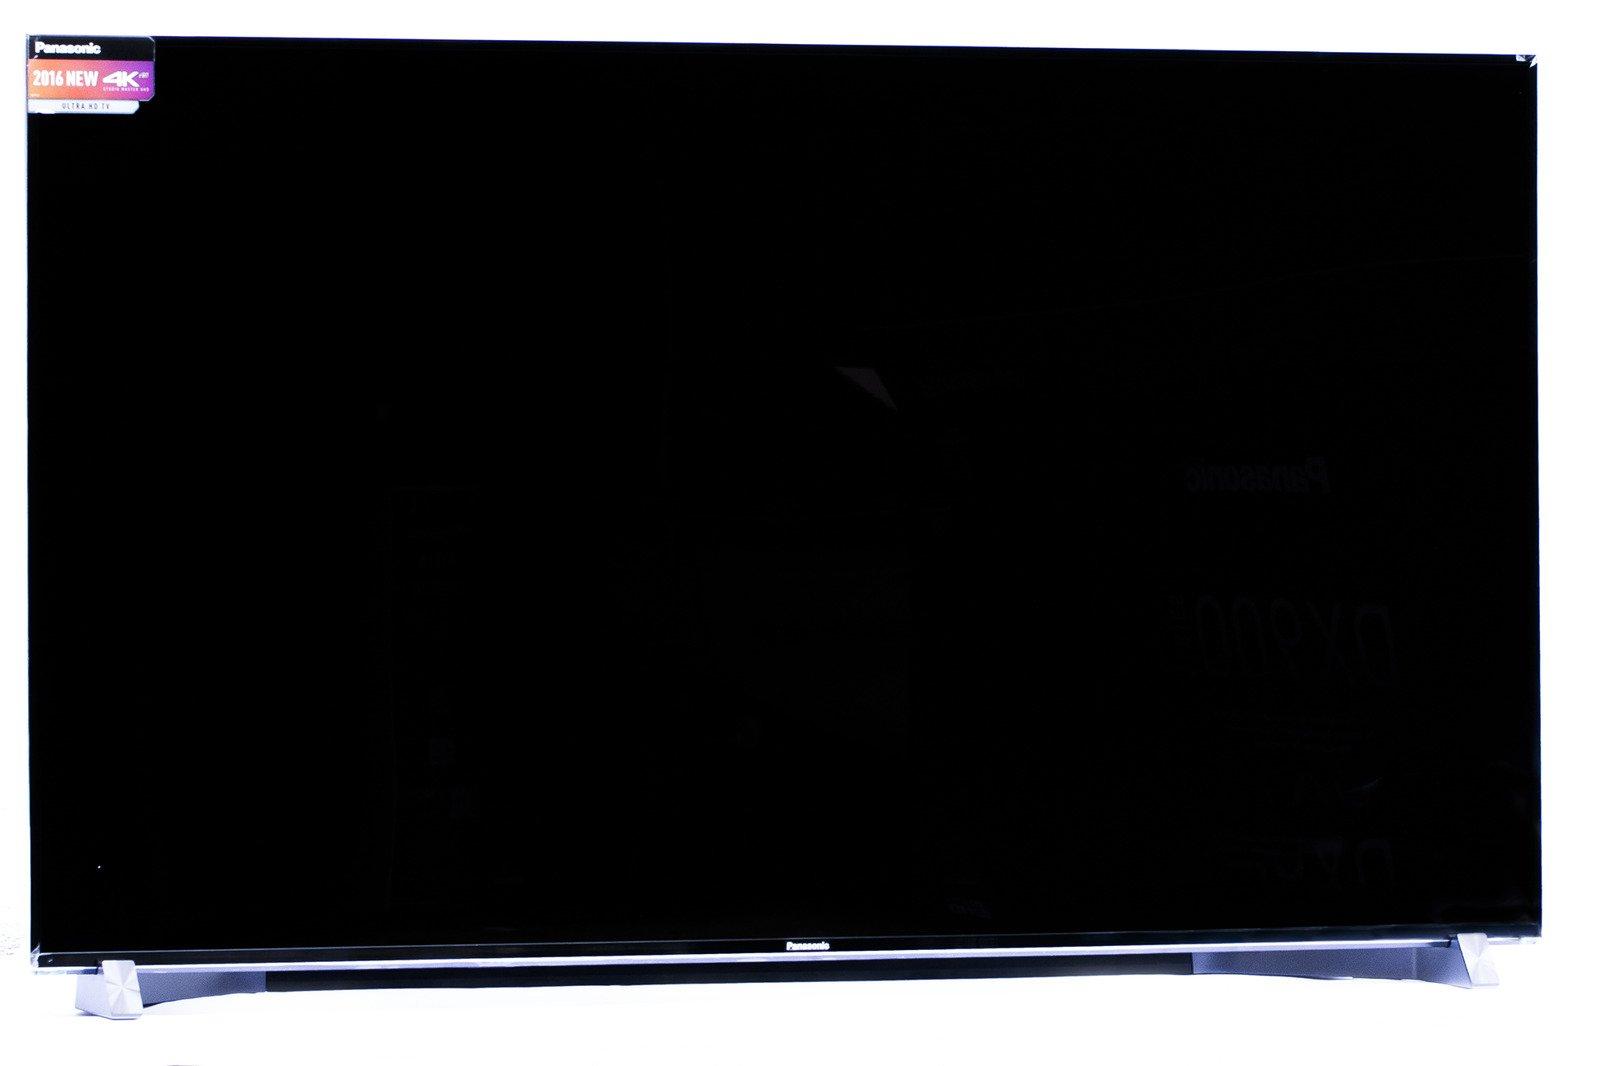 Panasonic Viera TX-65DXR900 TV Driver for Windows Mac